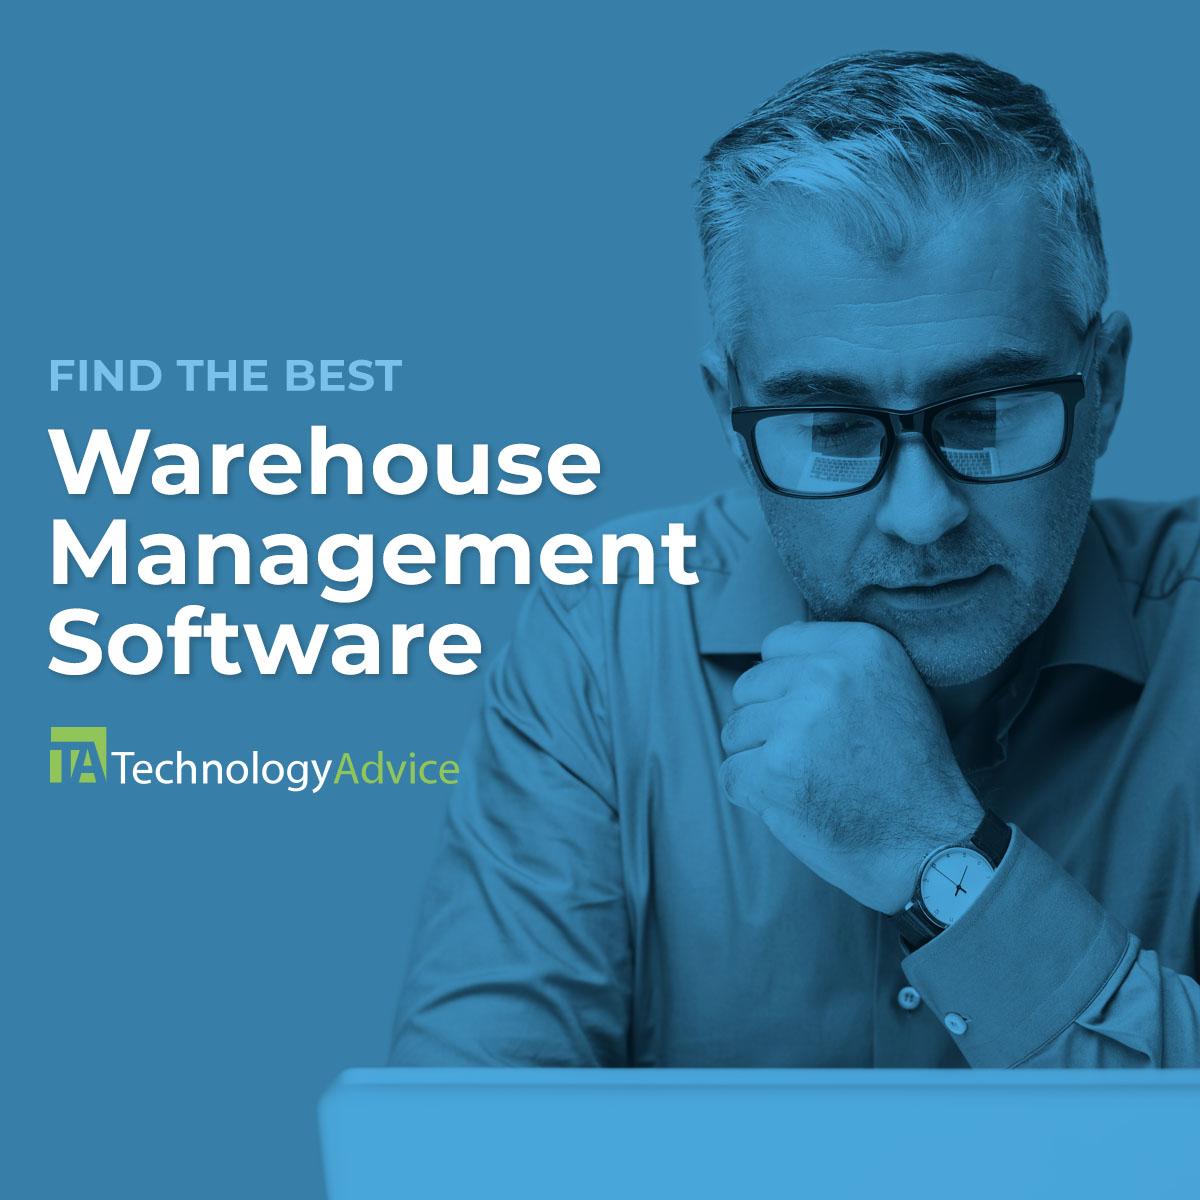 2019's Best Warehouse Management Software | TechnologyAdvice